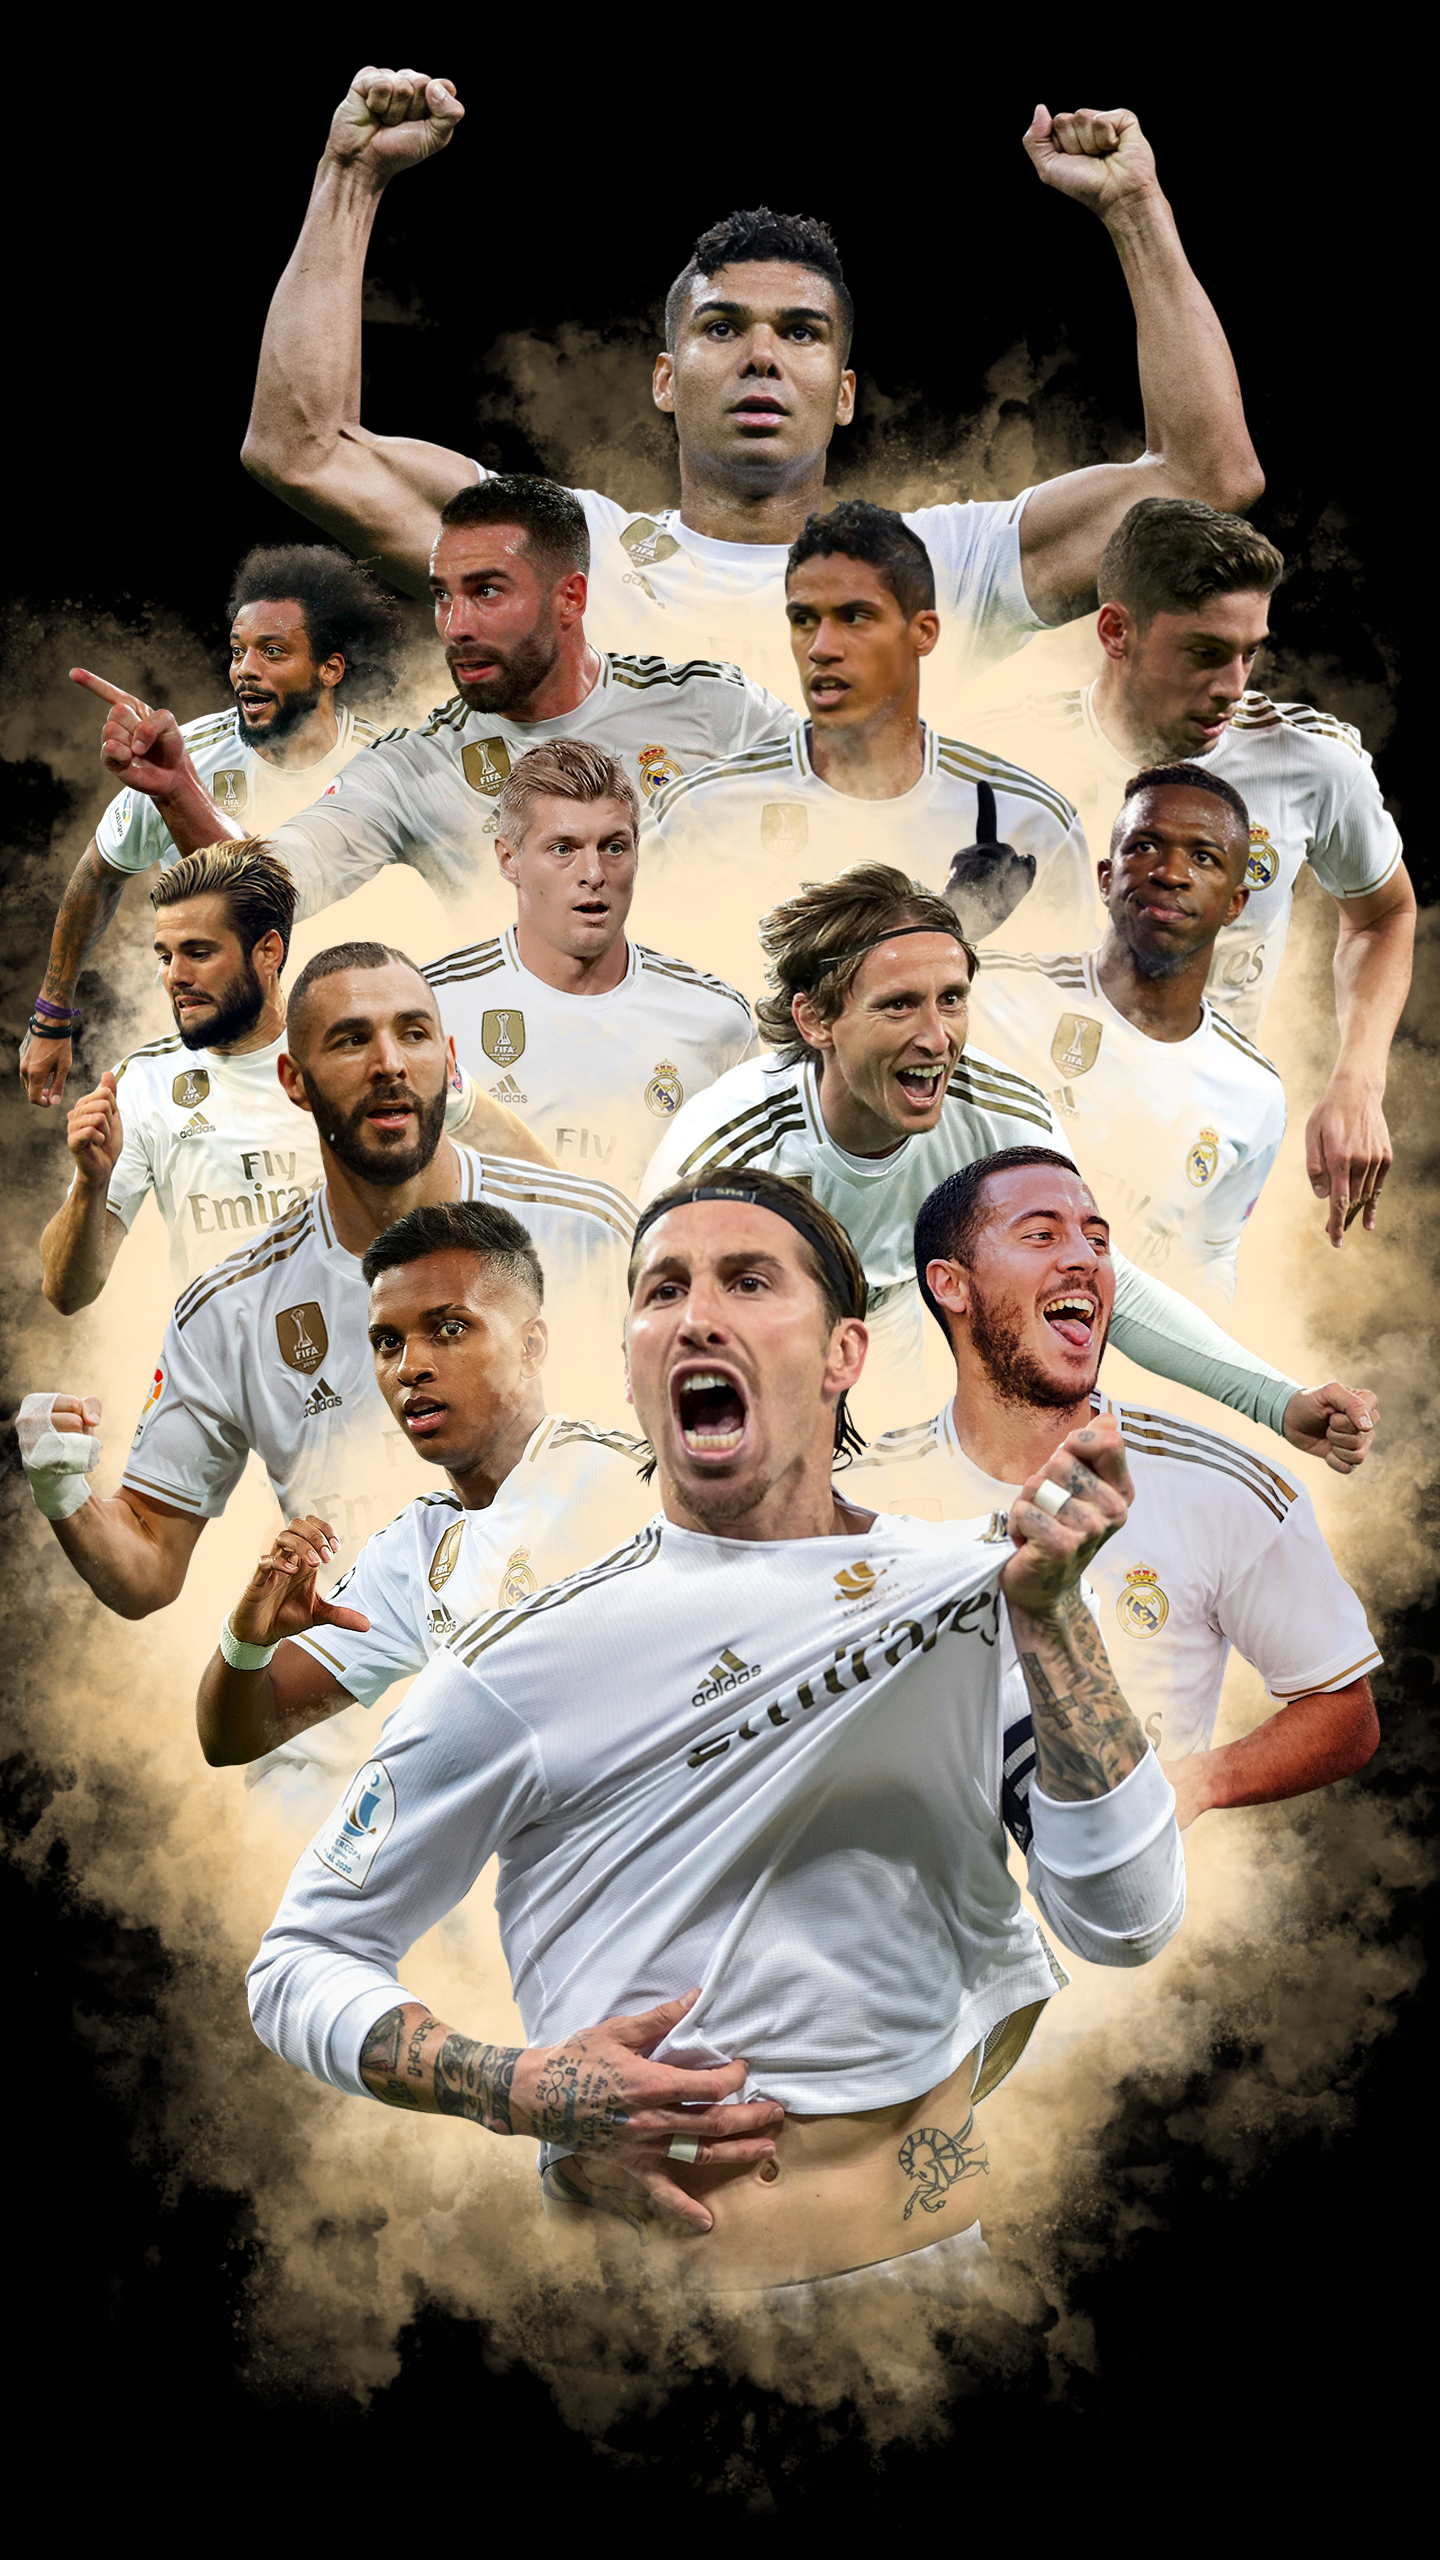 [OC] AMOLED Real Madrid Wallpaper